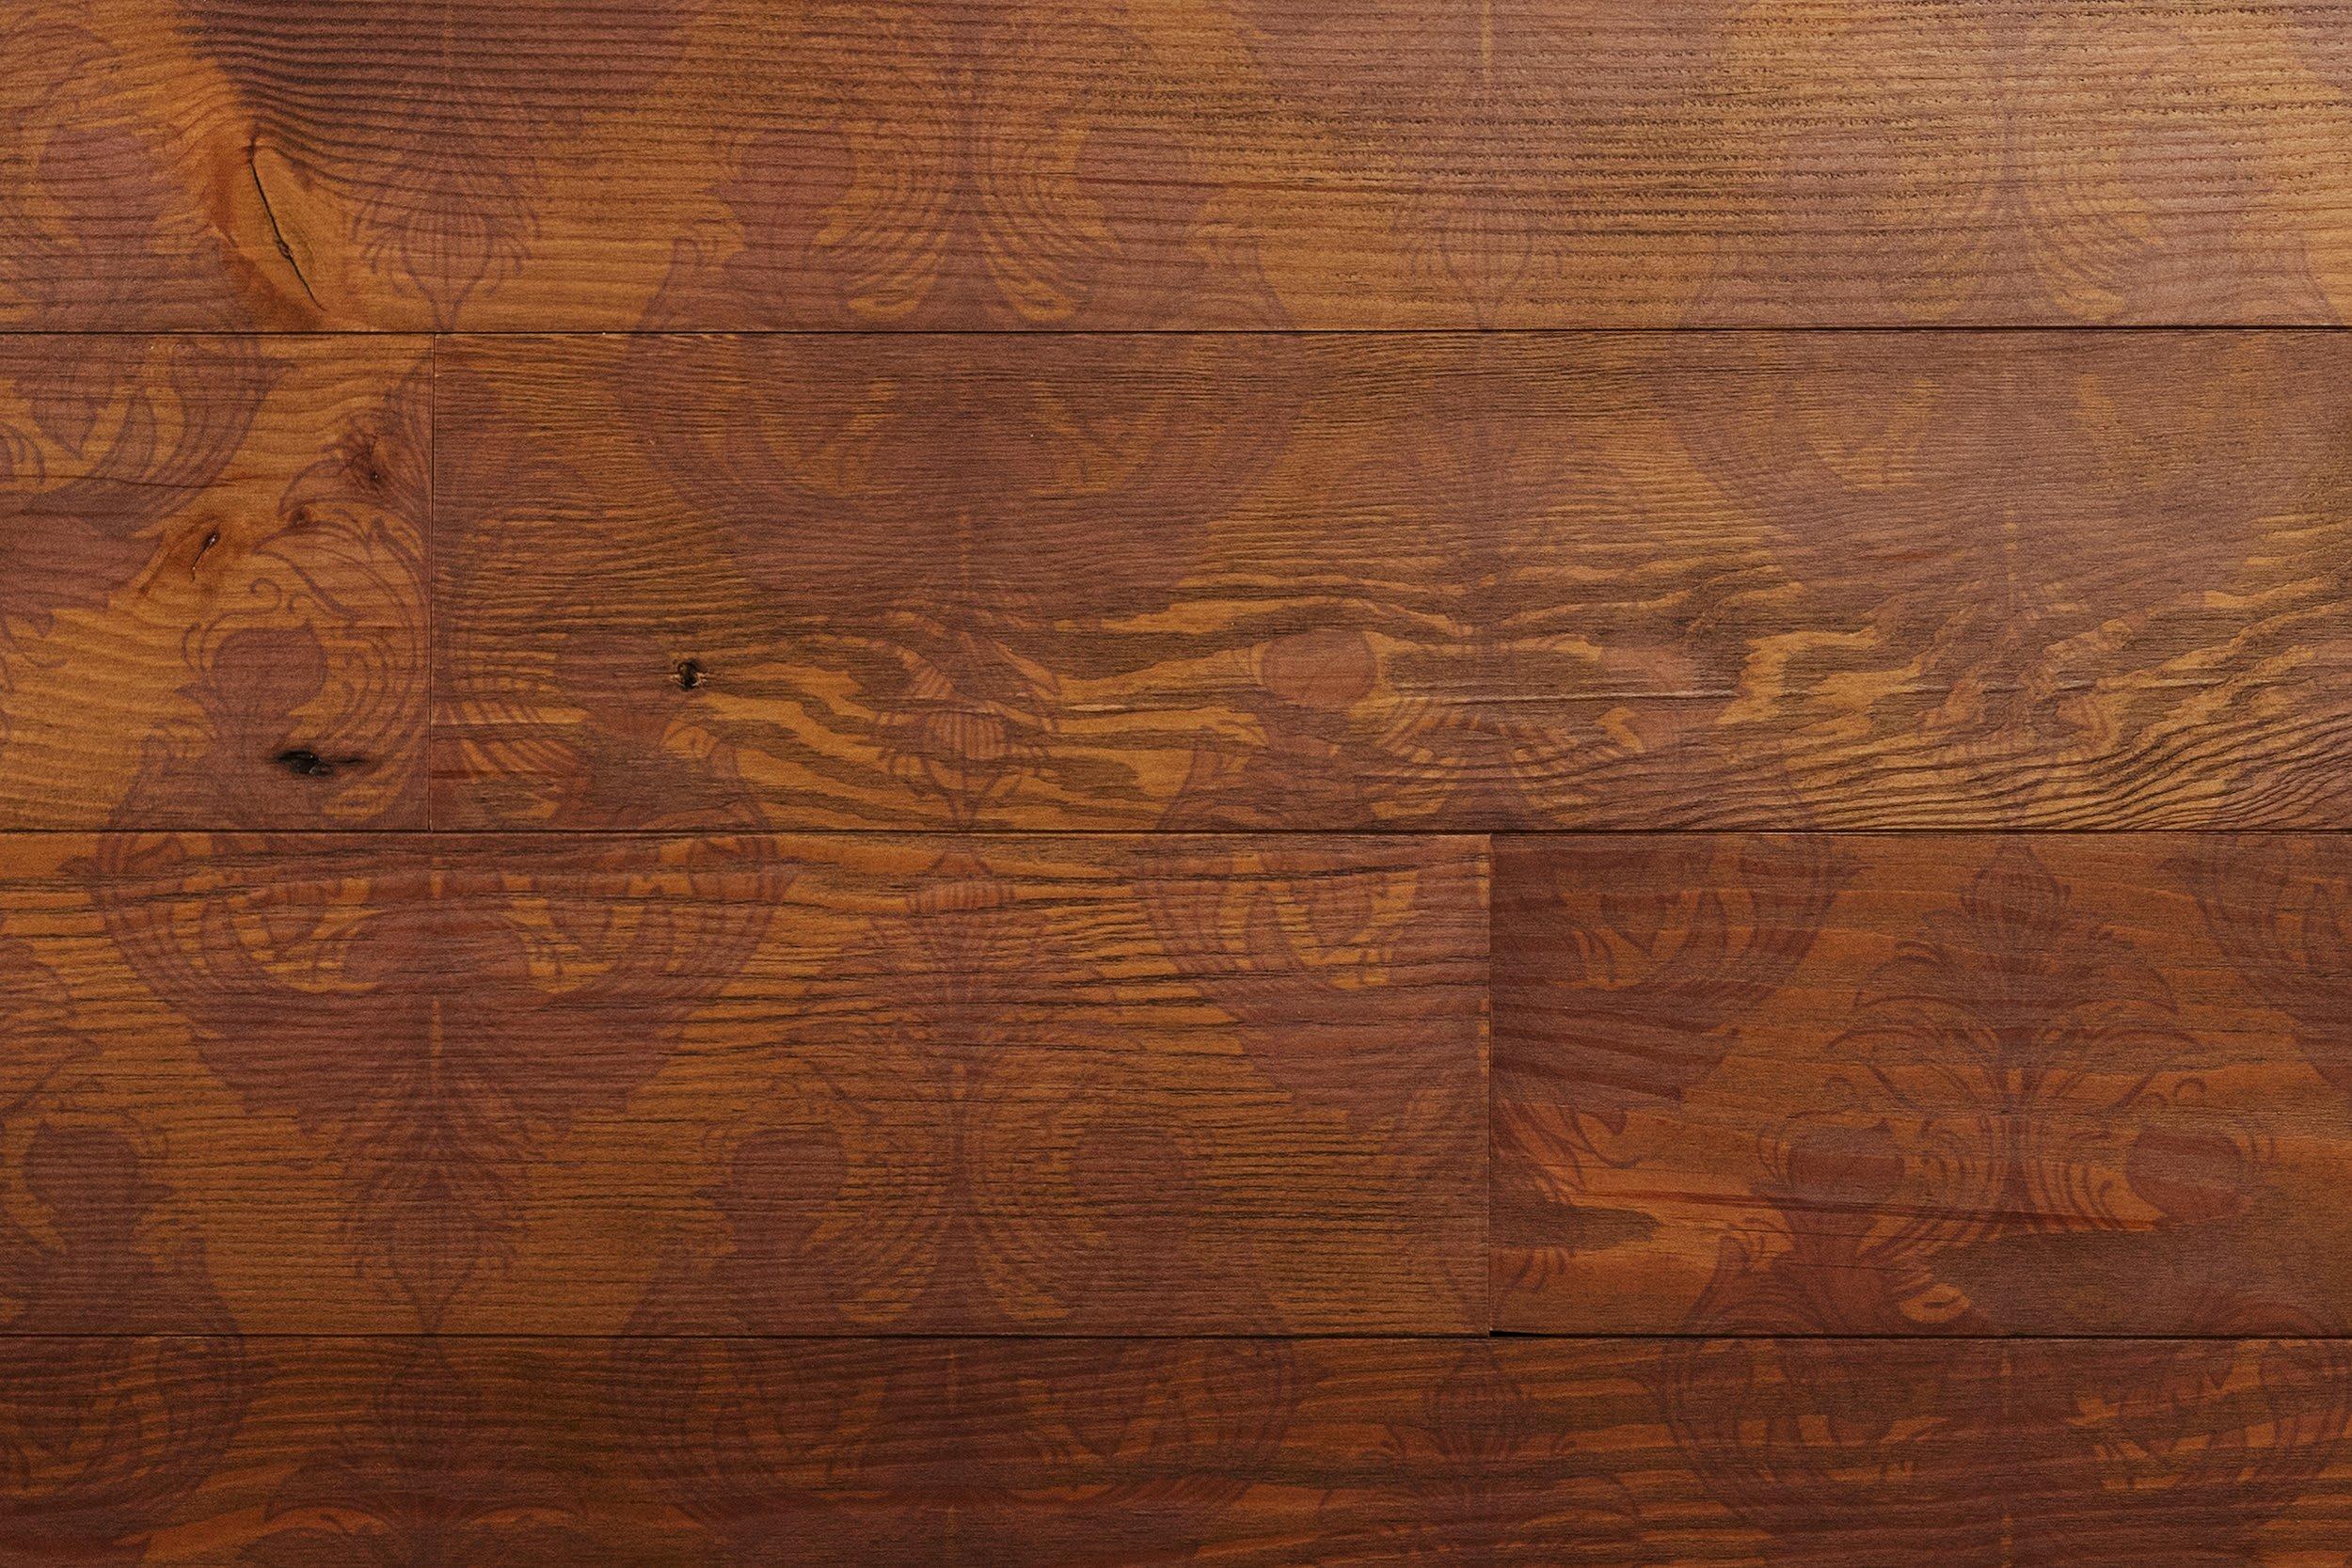 Victoria Vandyke peel and stick wood